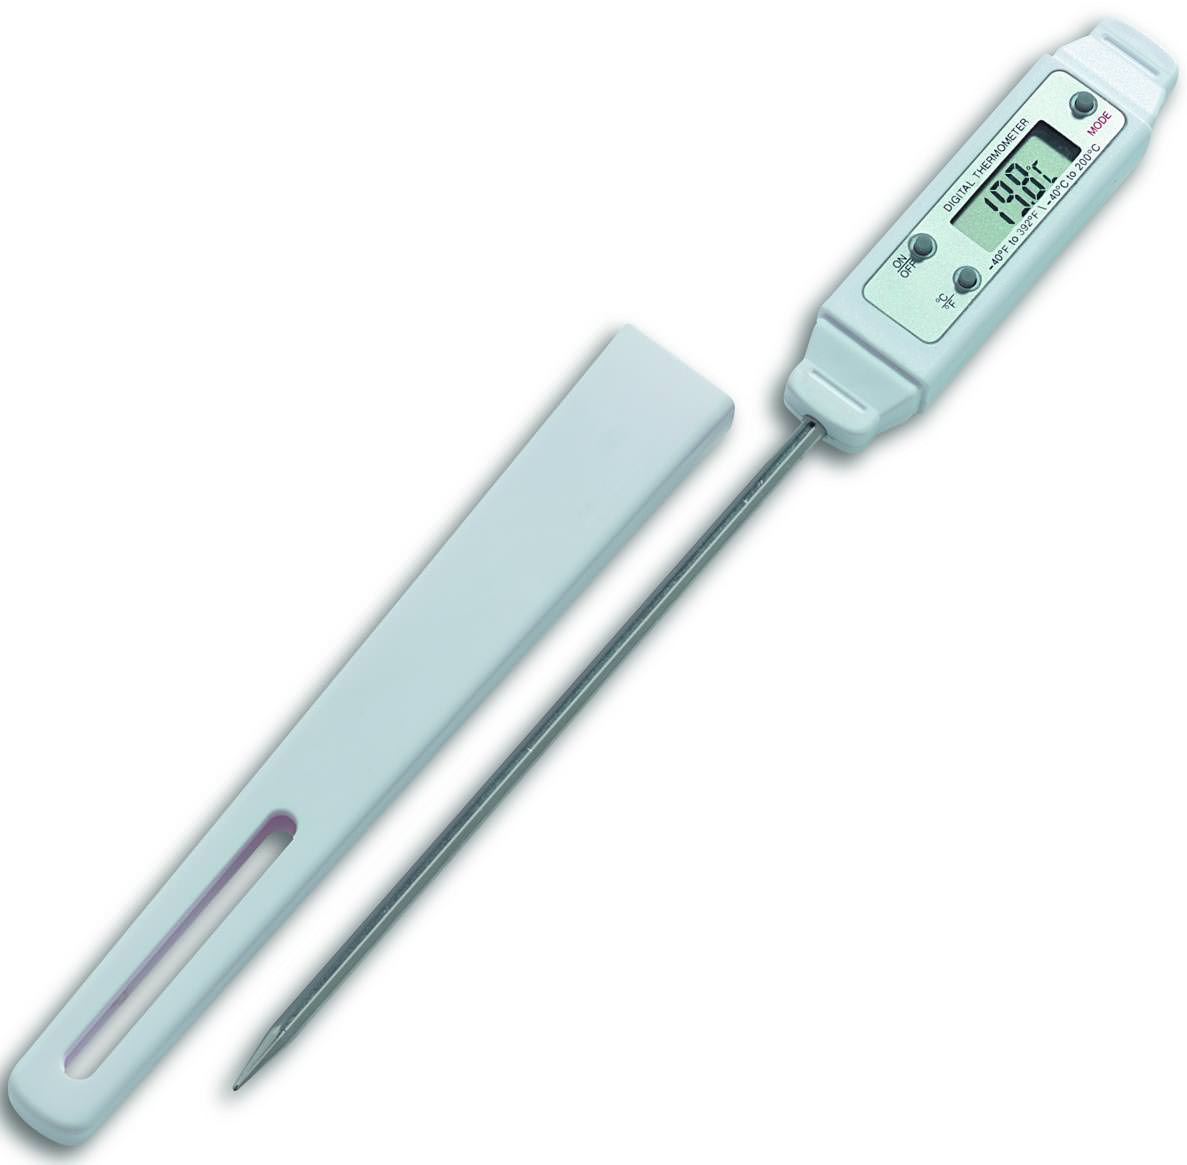 Probe Thermometer Roasting Tfa 30.1018 Kitchen Haccp Min-Max Hold Ip ...